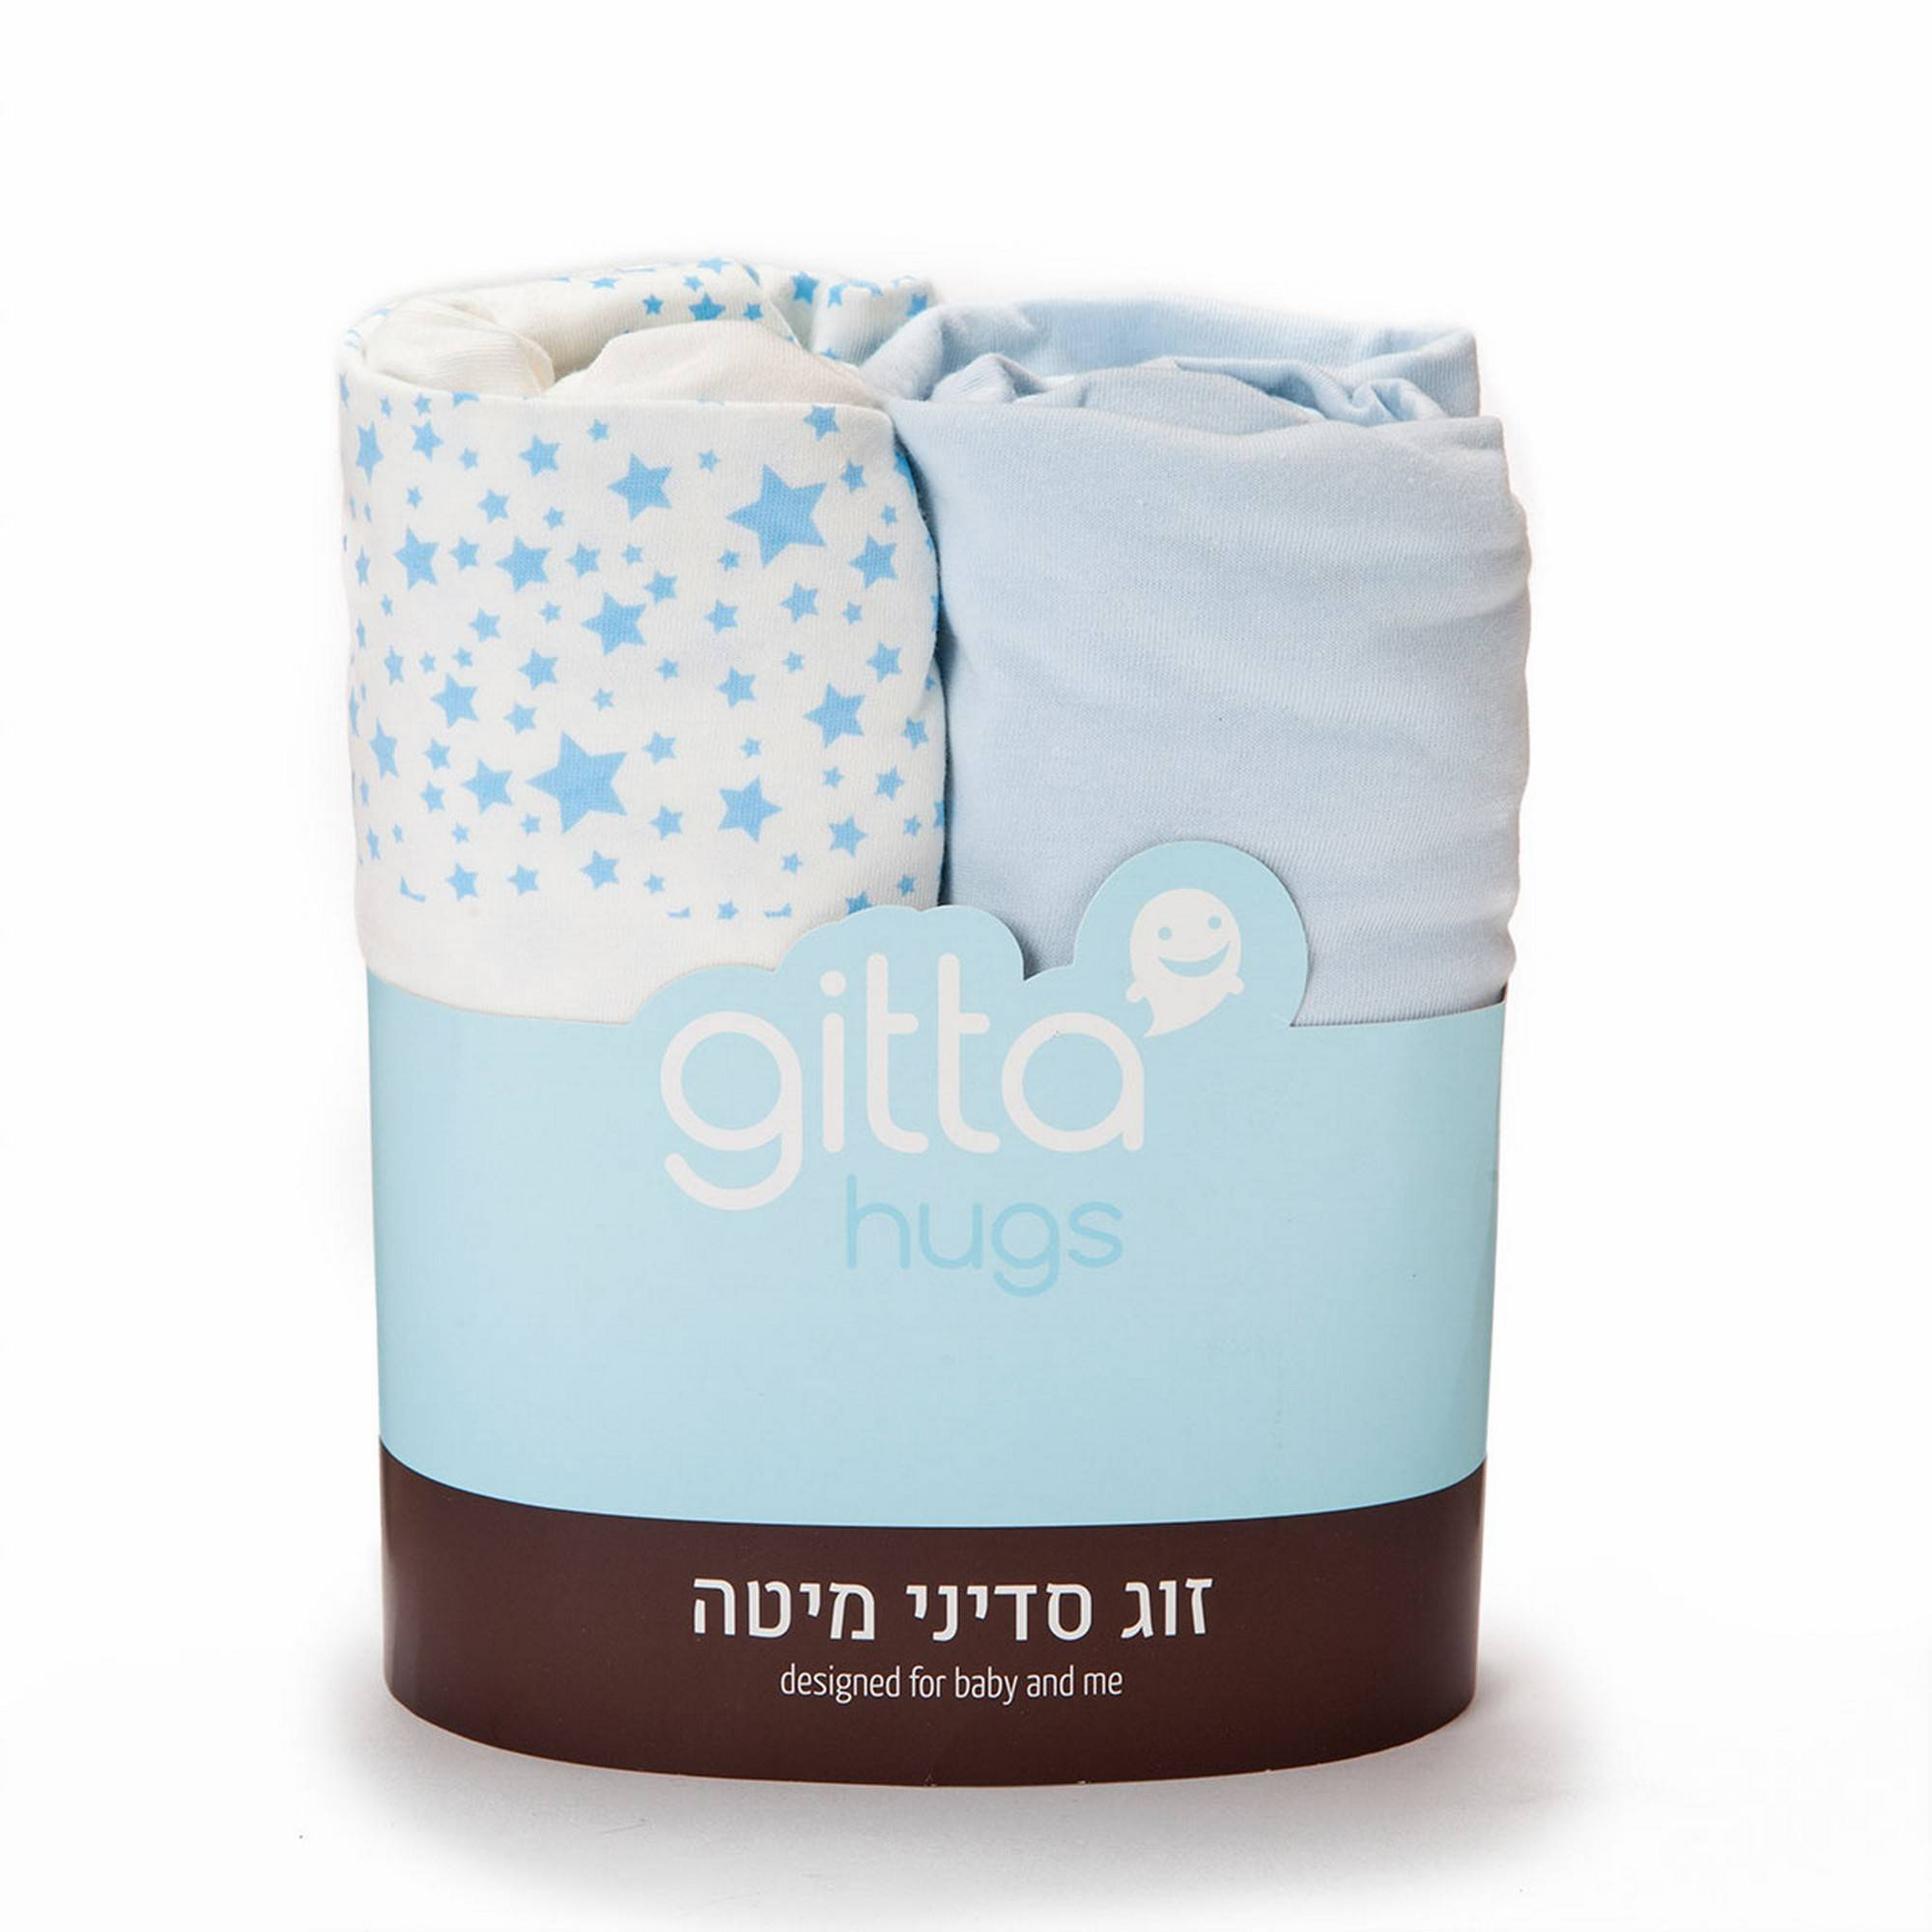 GITTA Cot Sheets - Blue Stars